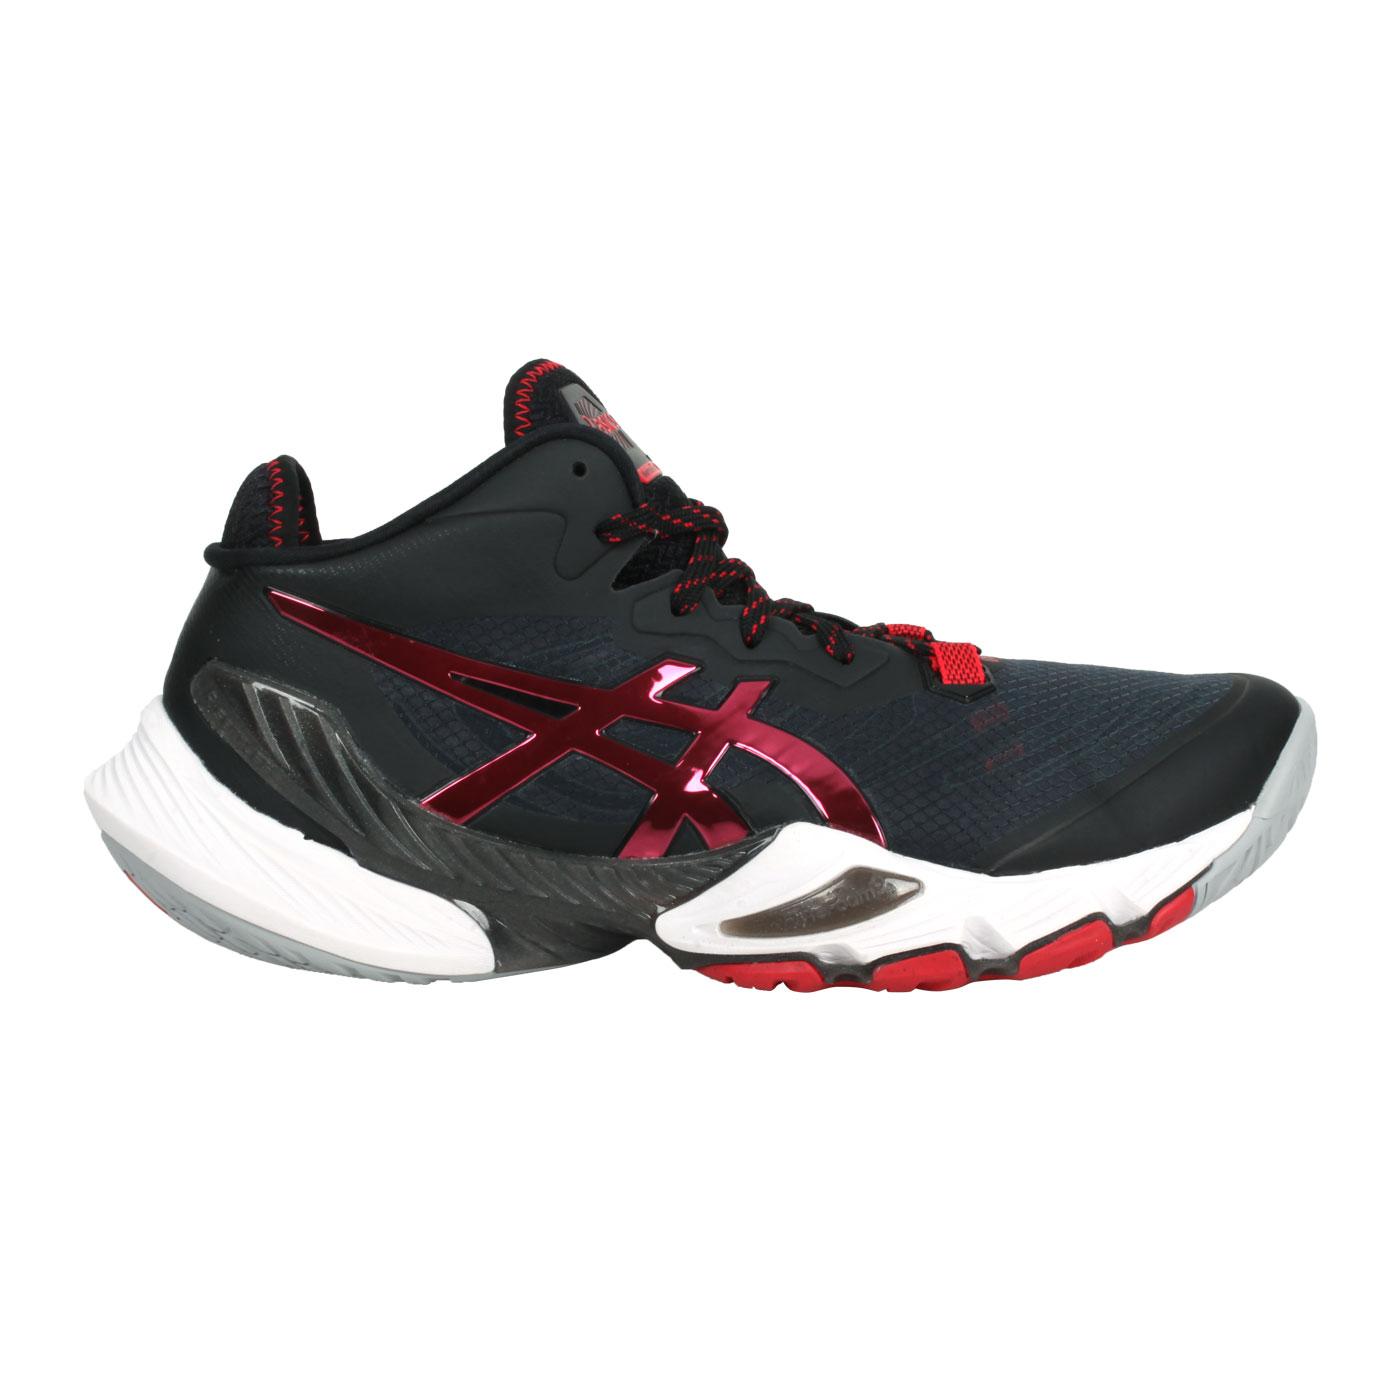 ASICS 限量-男款排羽球鞋  @METARISE@1051A058-001 - 黑紅